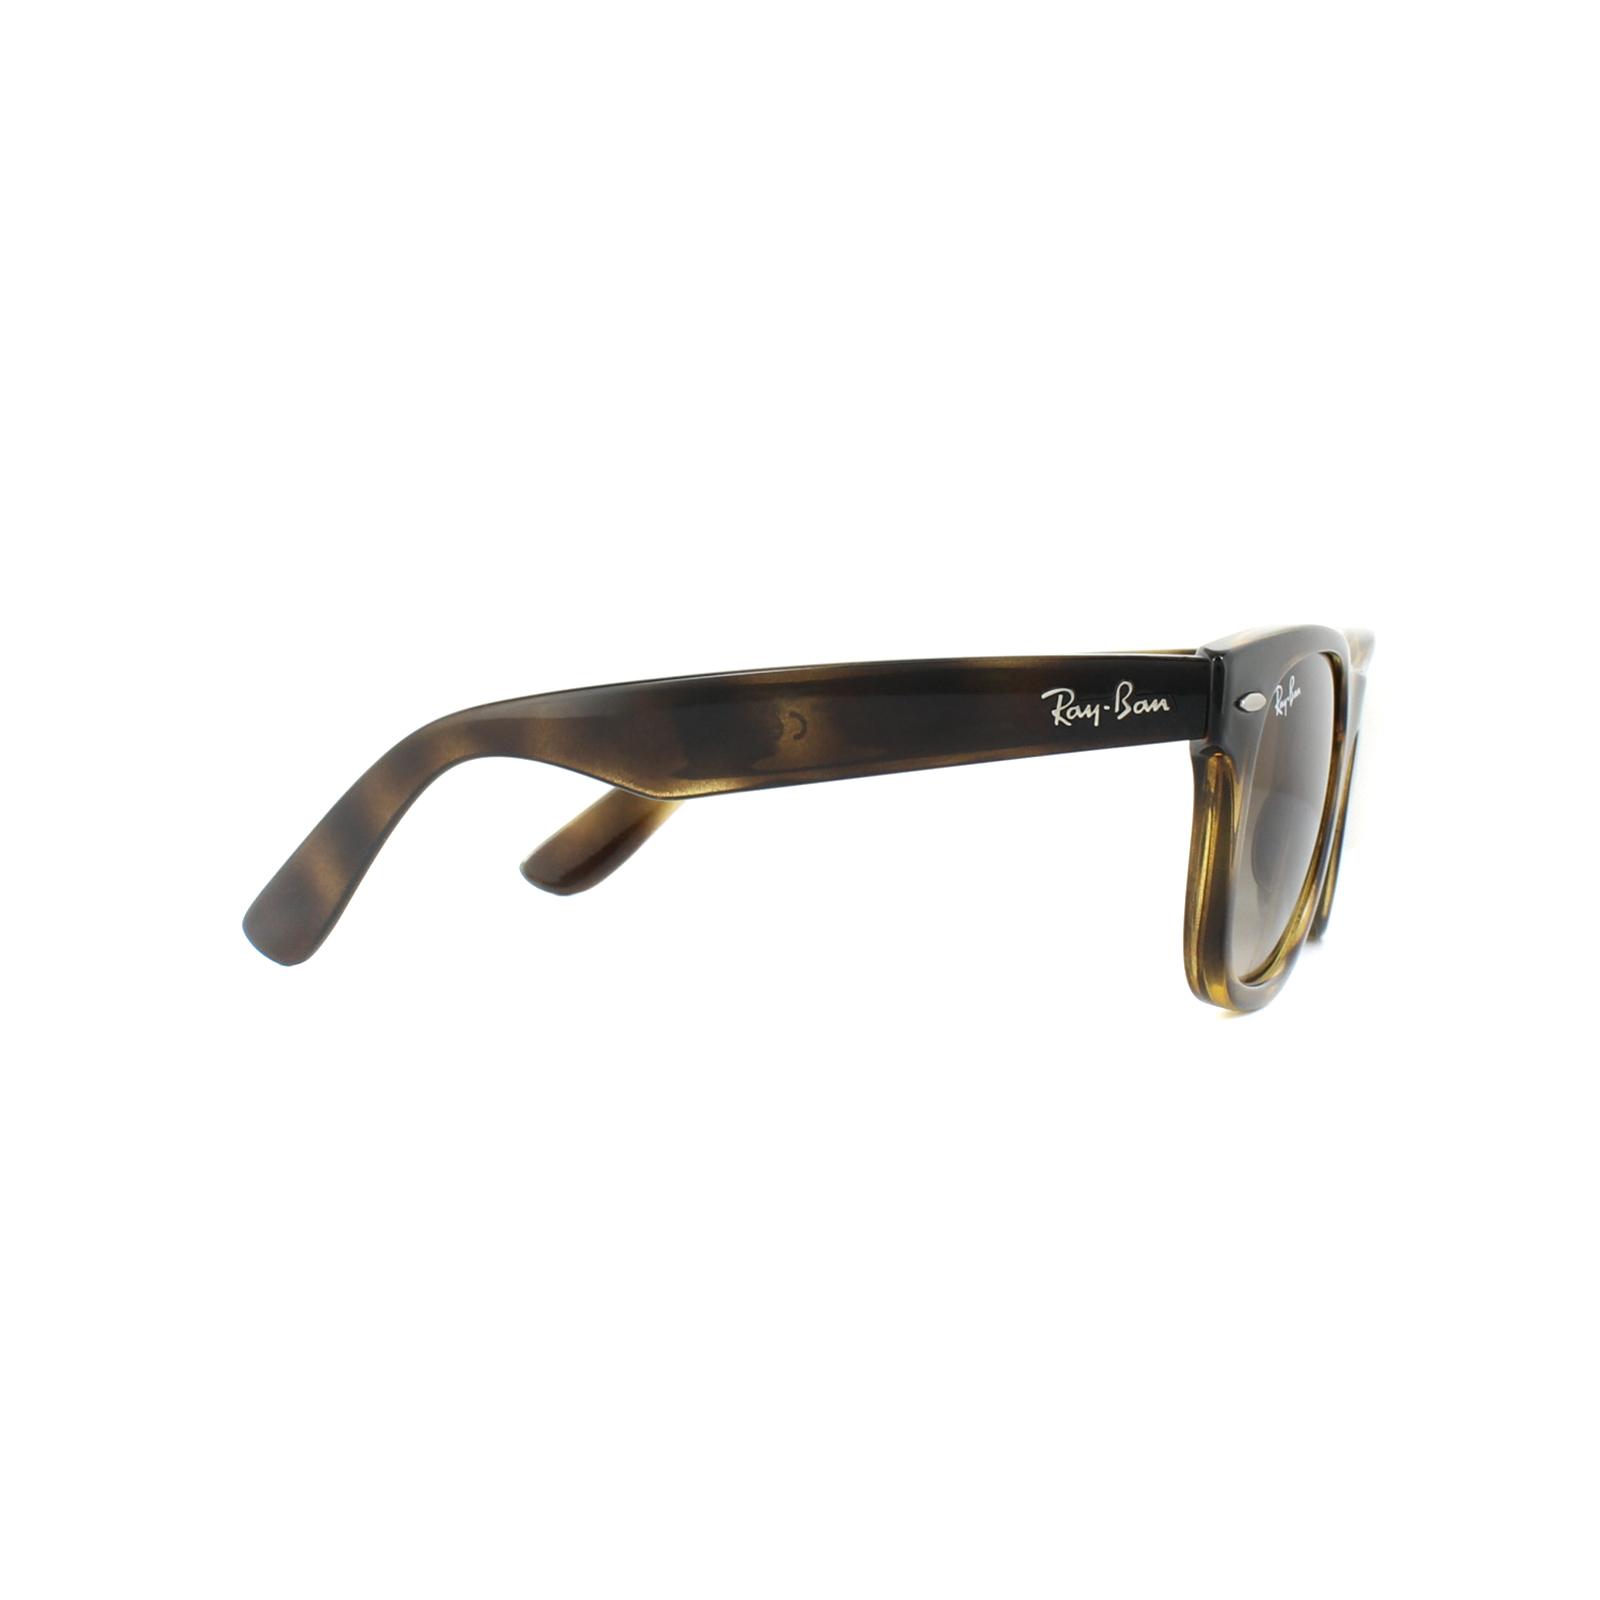 6084c49cac899f Sentinel Ray-Ban Junior Sunglasses New Wayfarer Junior 9066S 152 13  Tortoise Brown B-